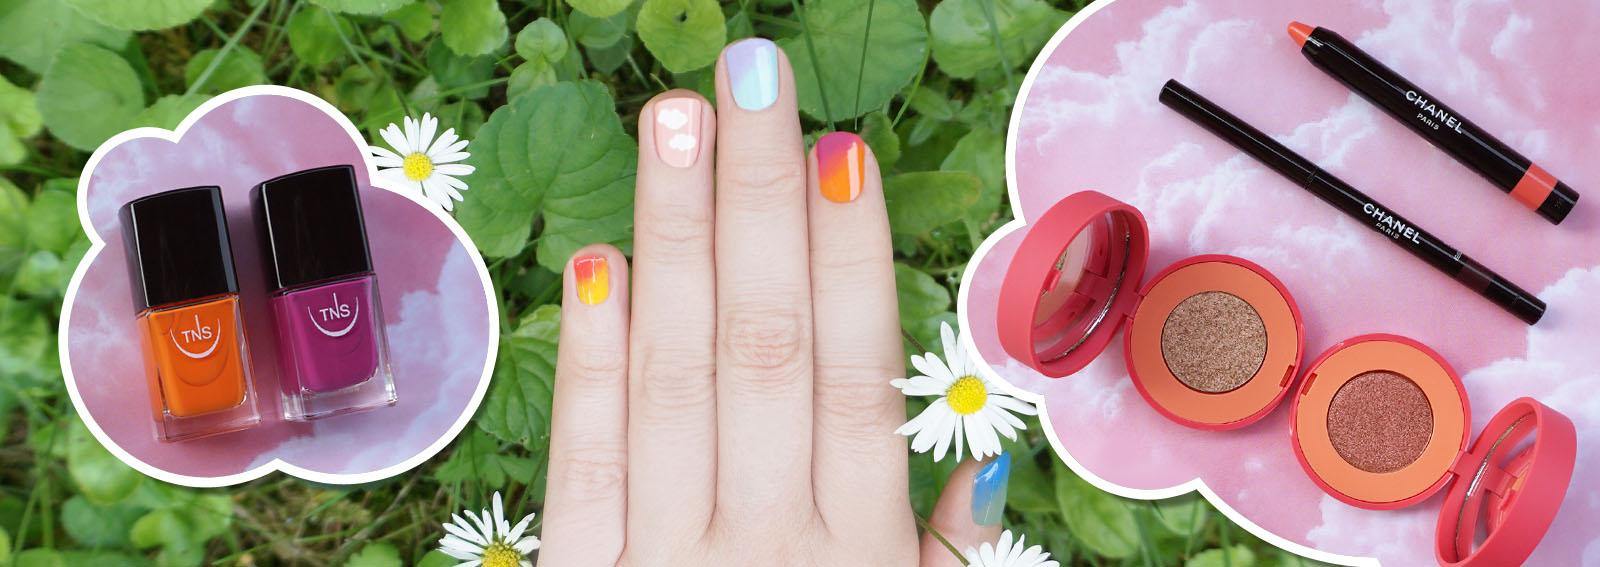 cover-la-nail-art-arcobaleno-creata-desktop